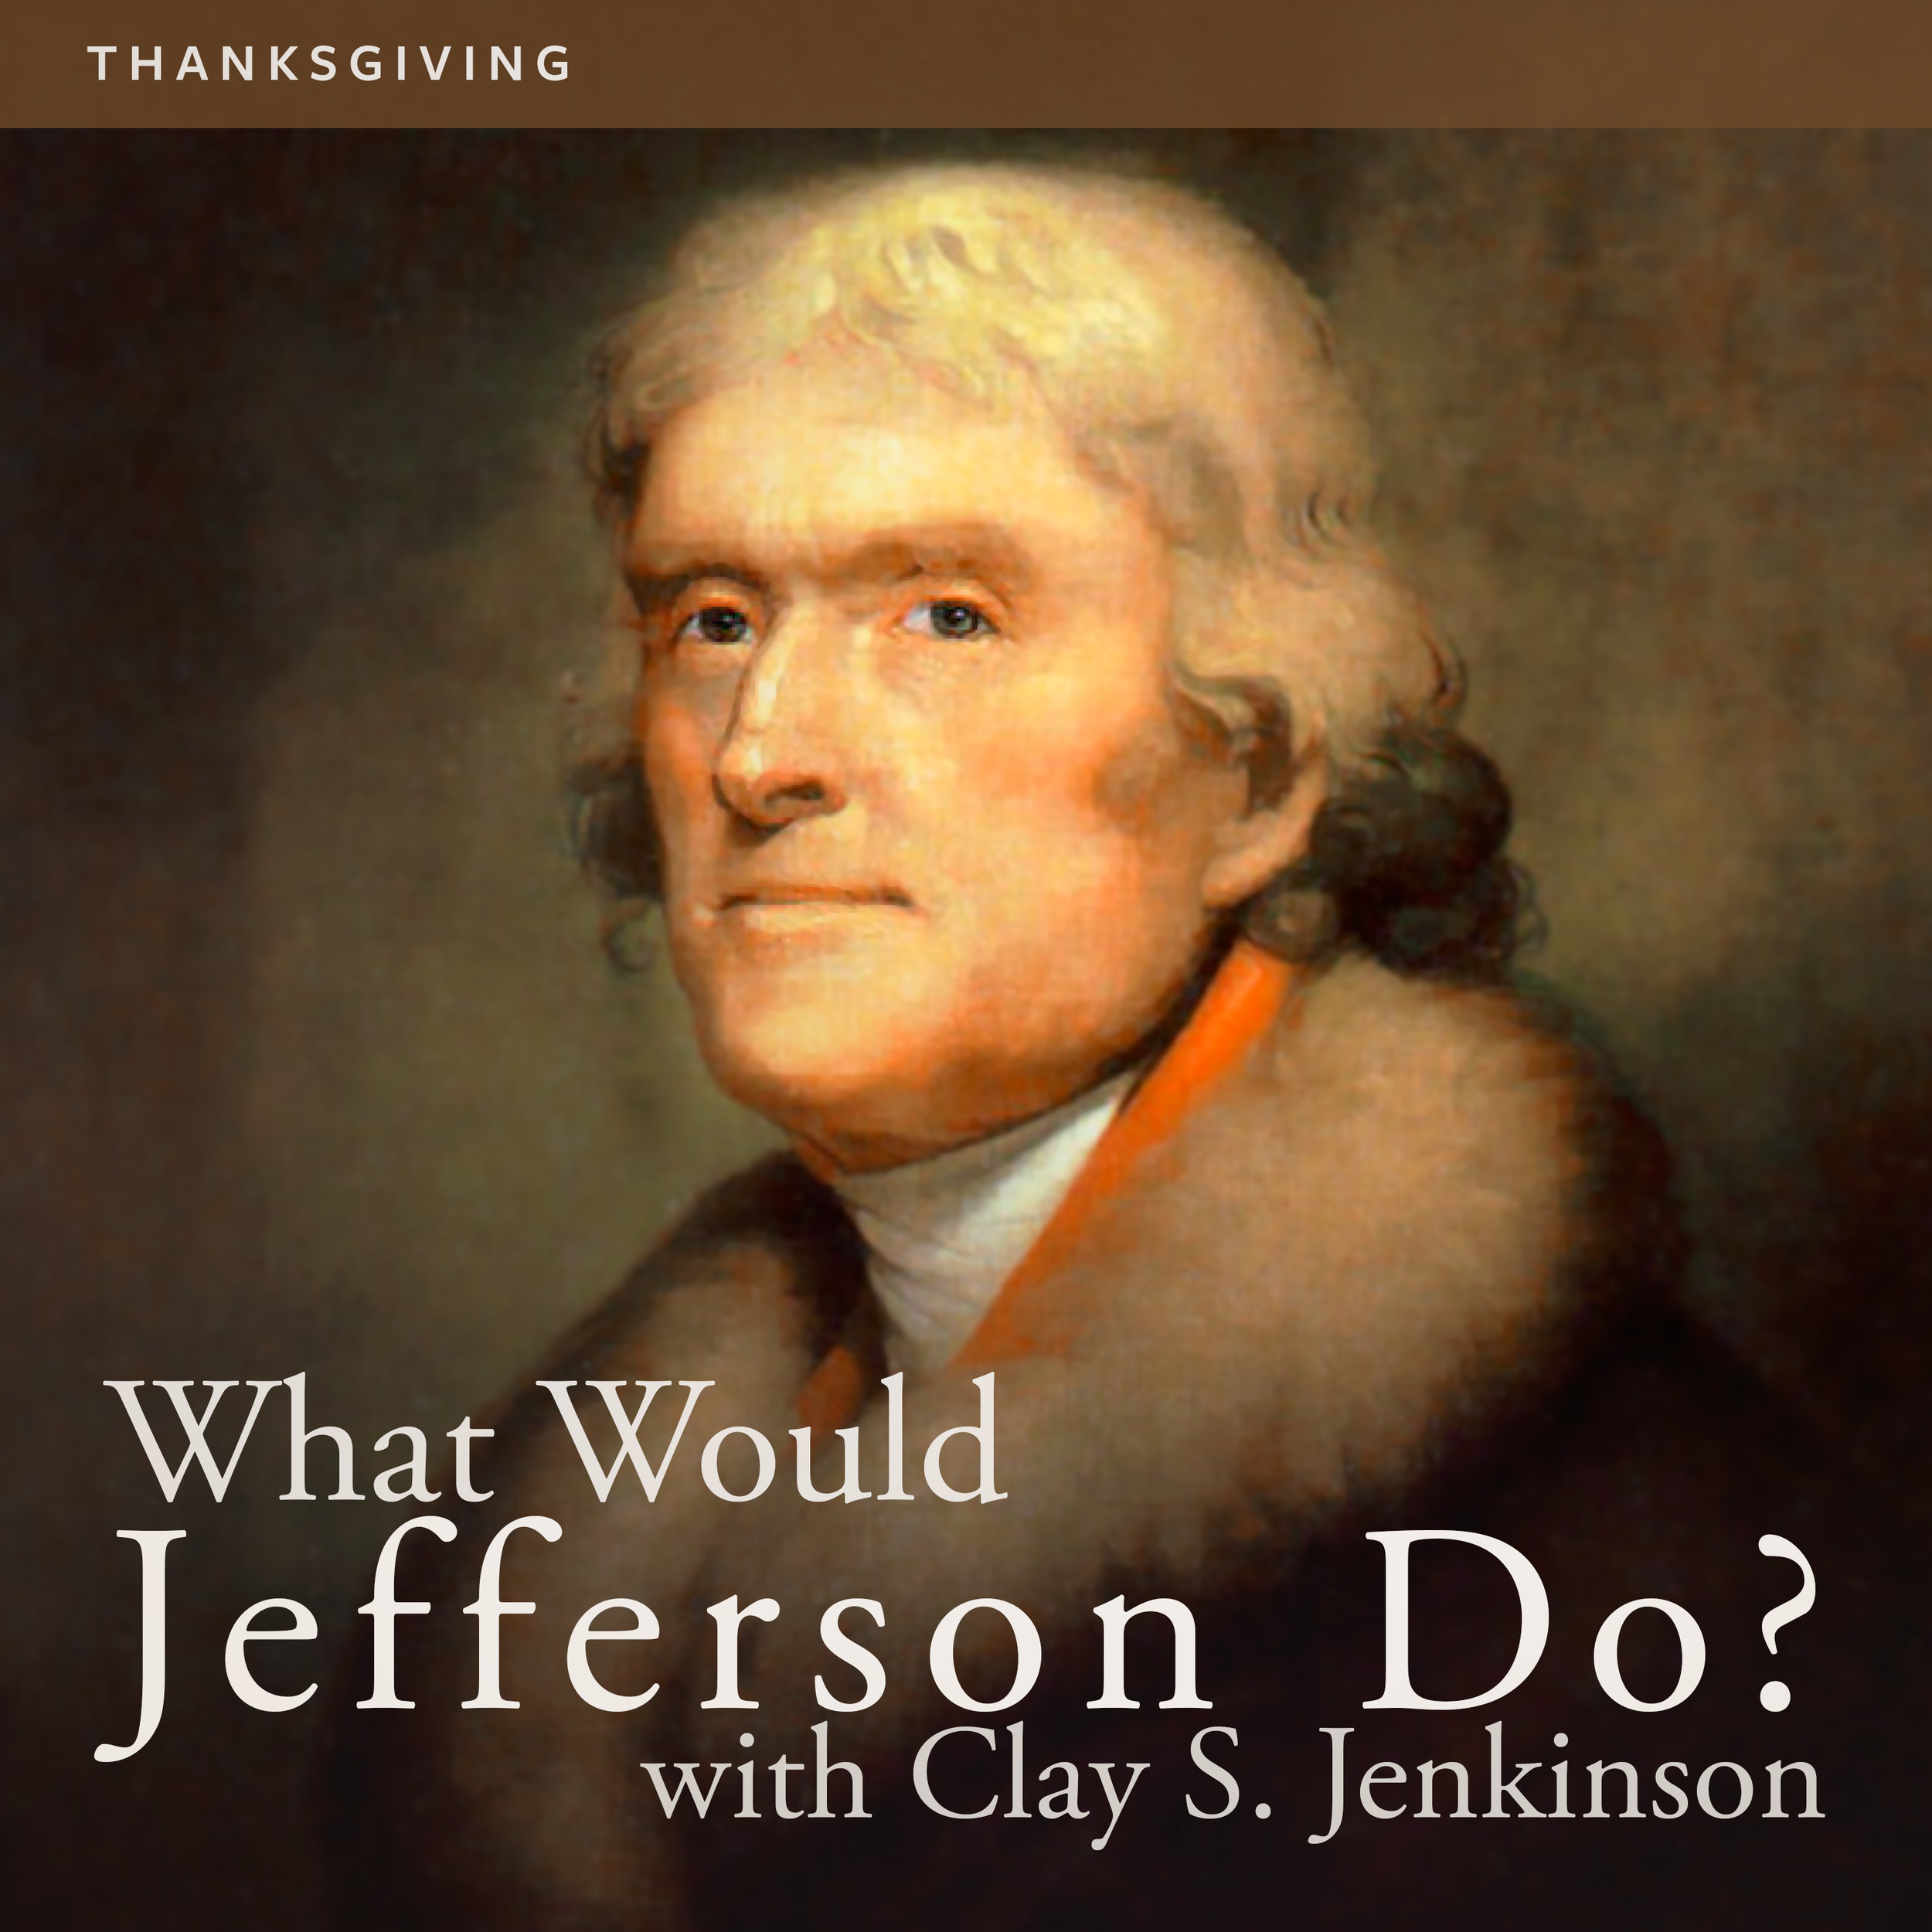 WWTJD_1313 Thanksgiving.jpg